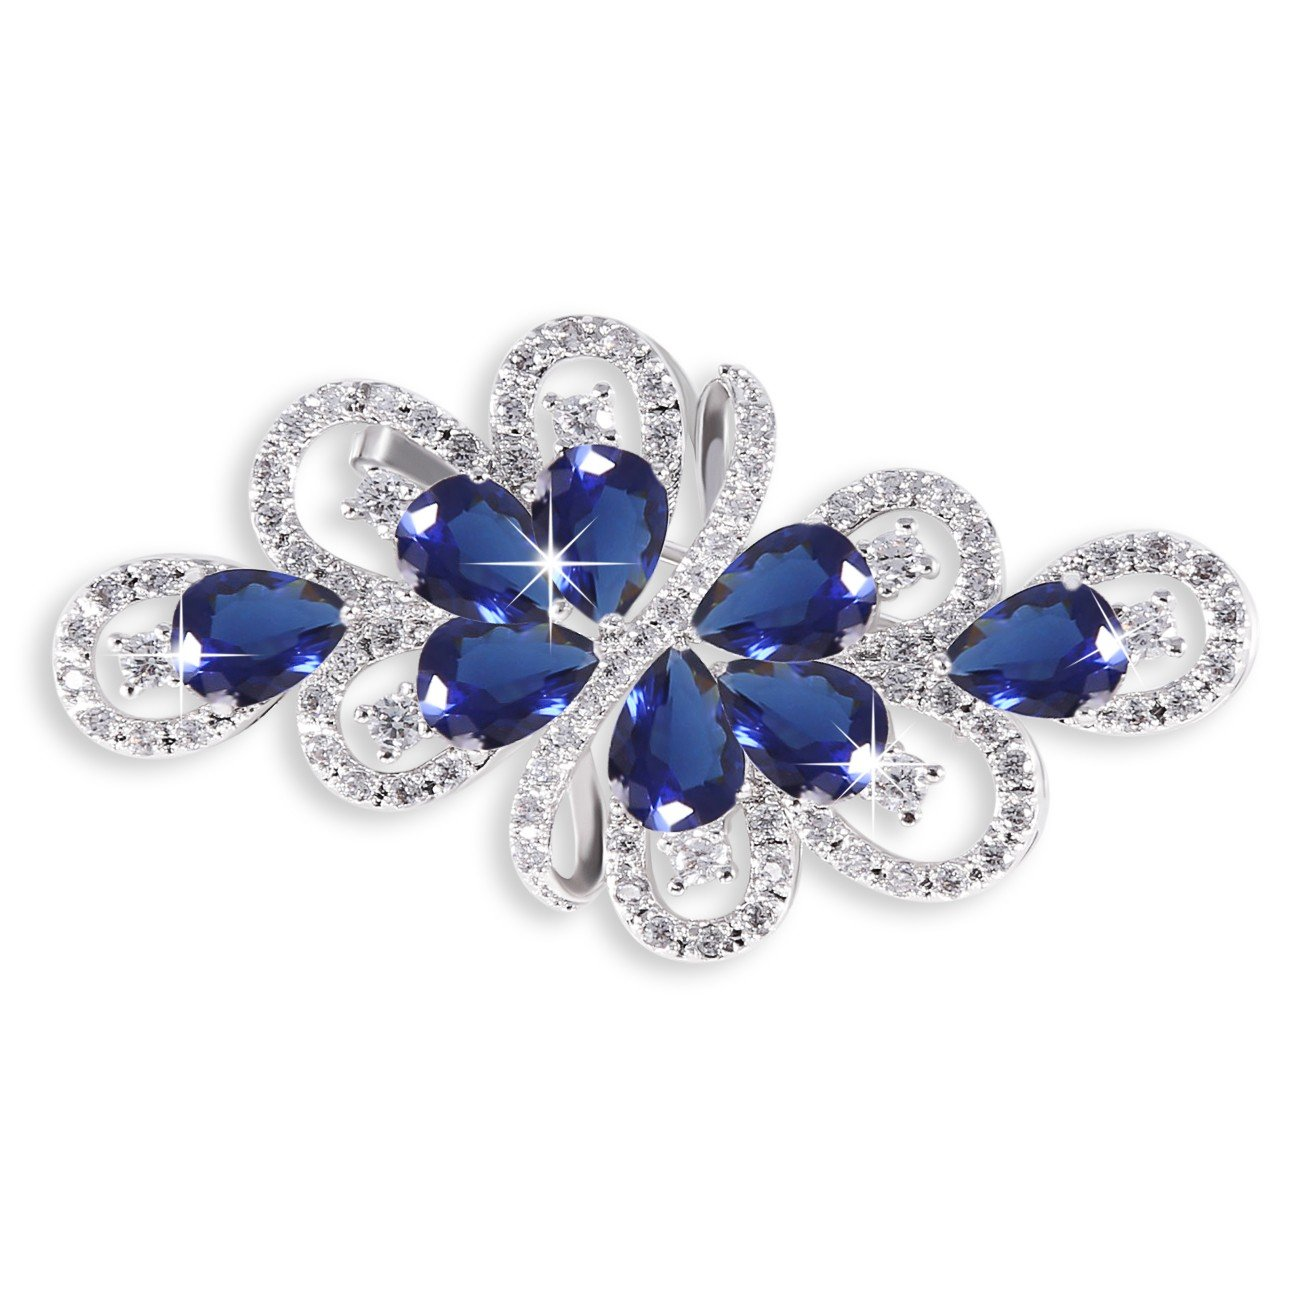 GULICX Blue Ribbon Bridal Silver Tone Brooch Bouquet Cubic Zirconia Wedding Jewelry